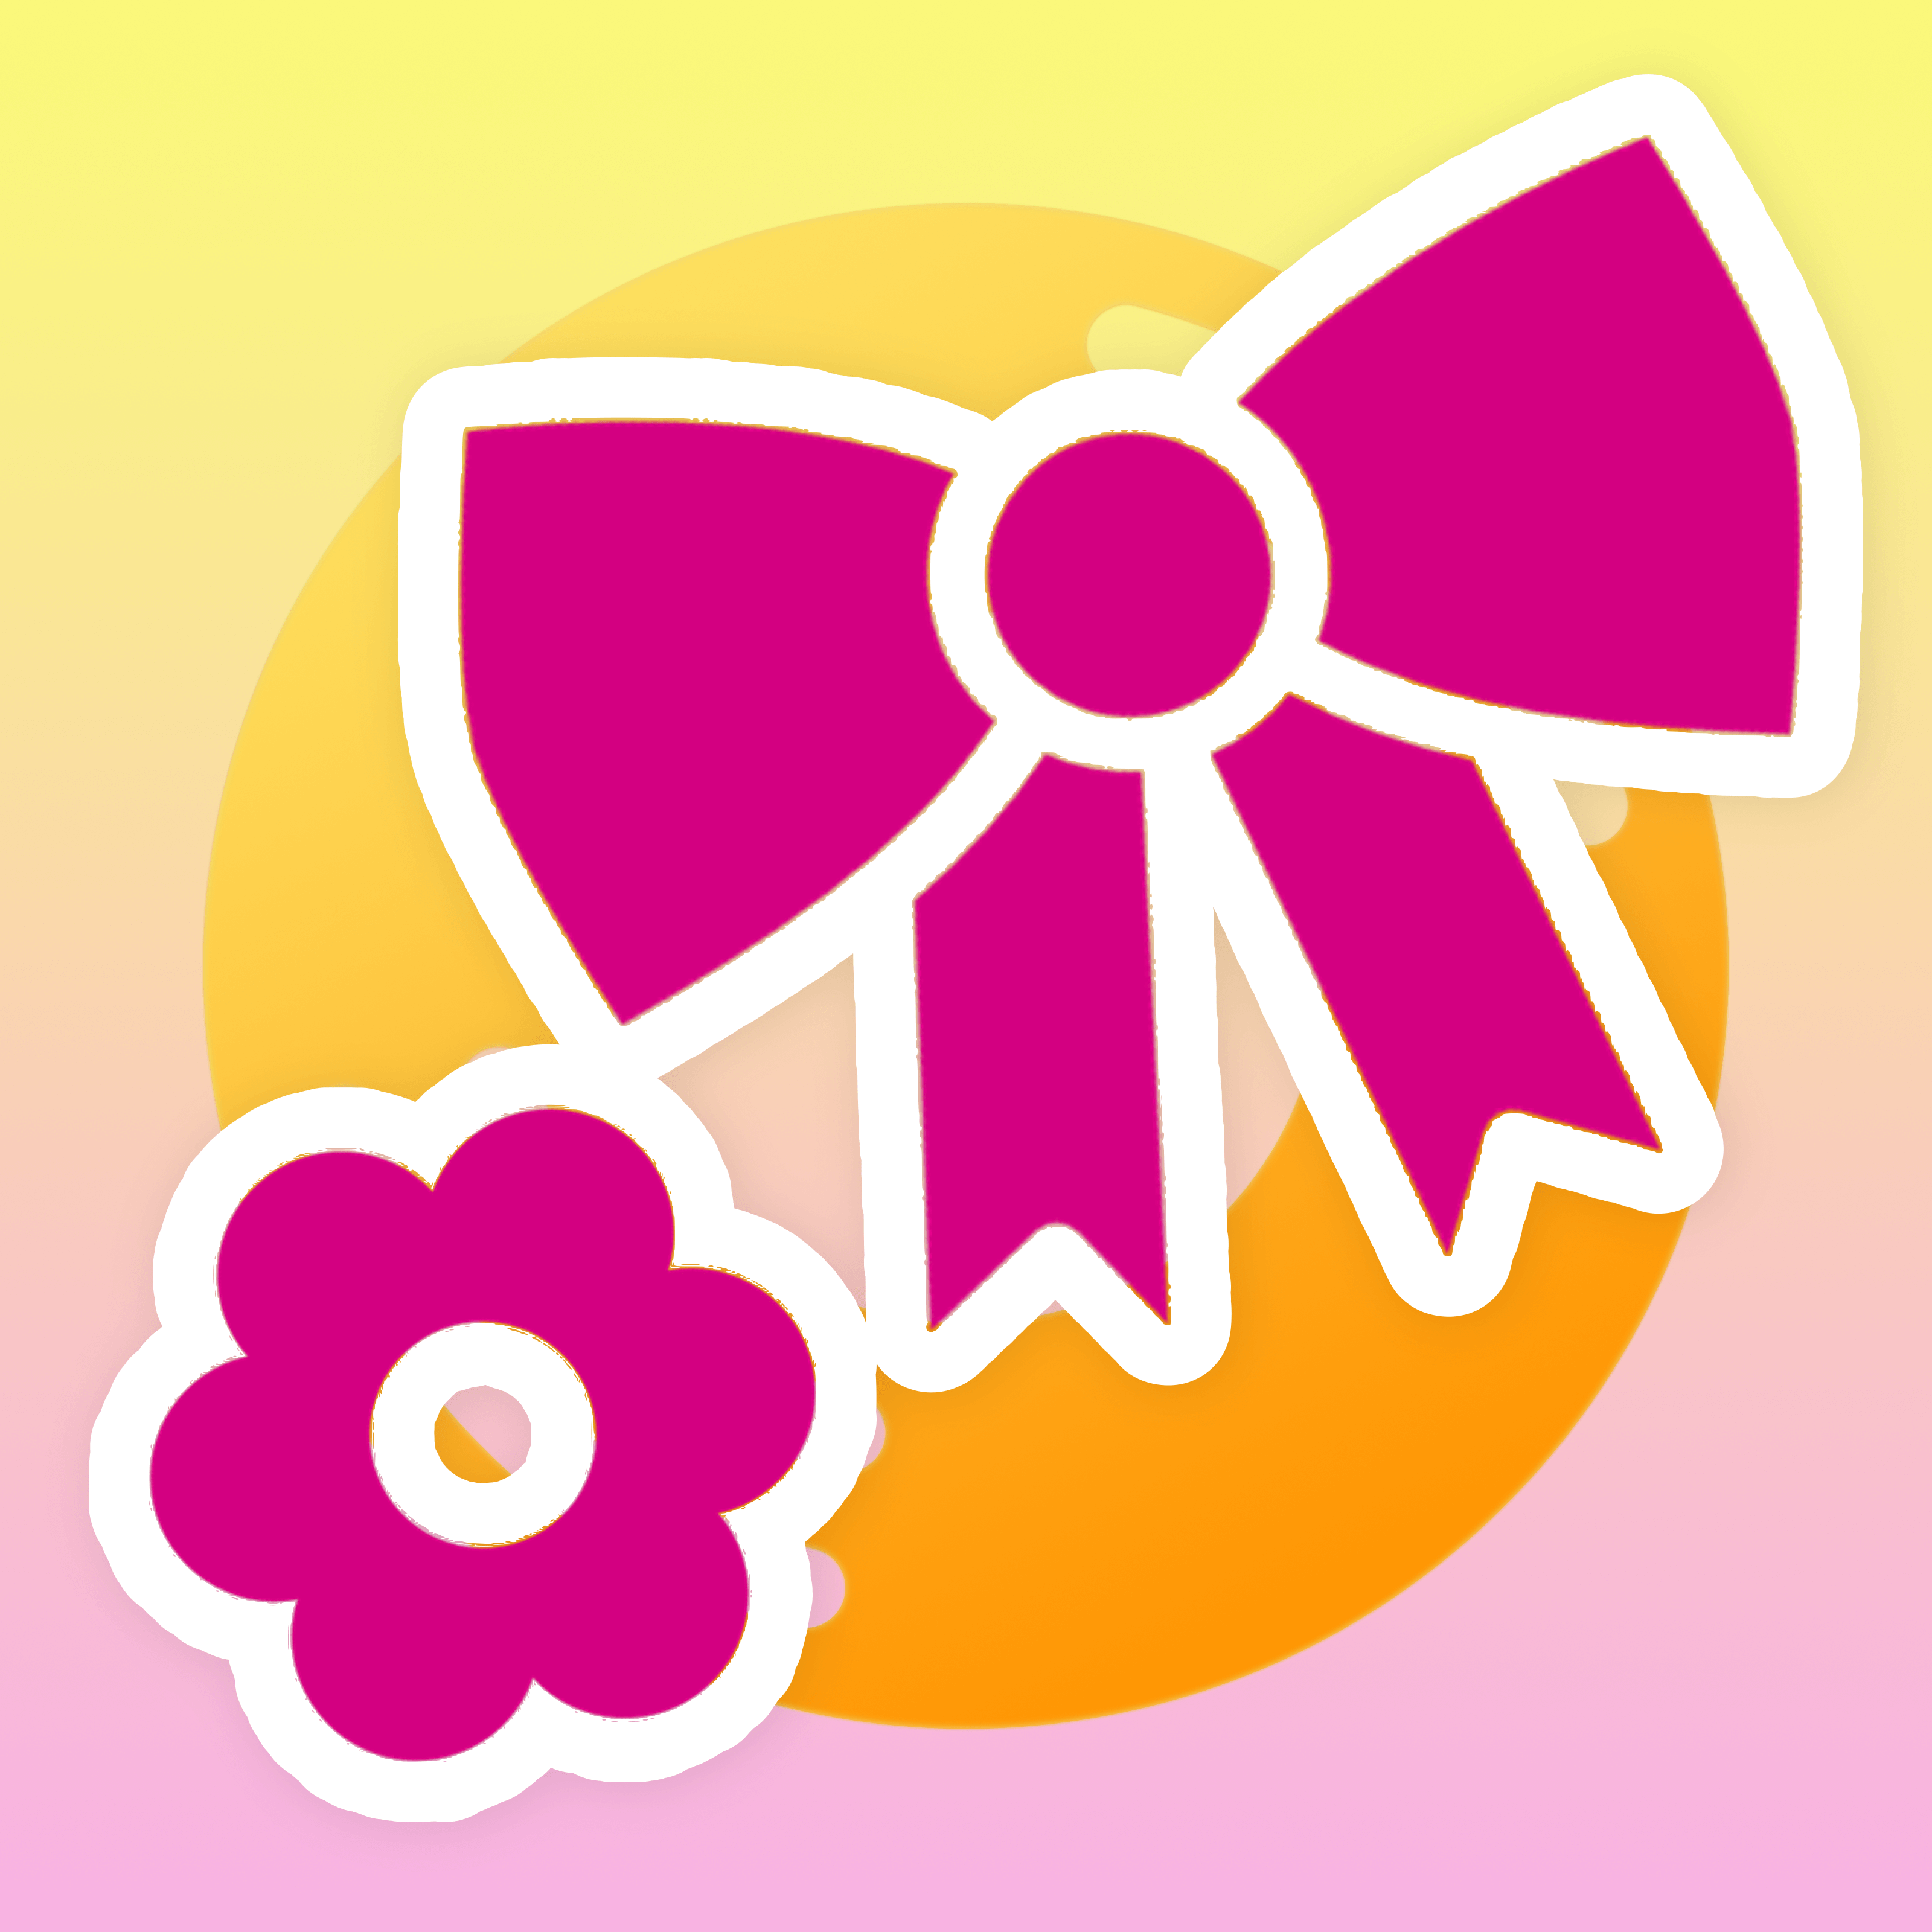 candy613022 avatar